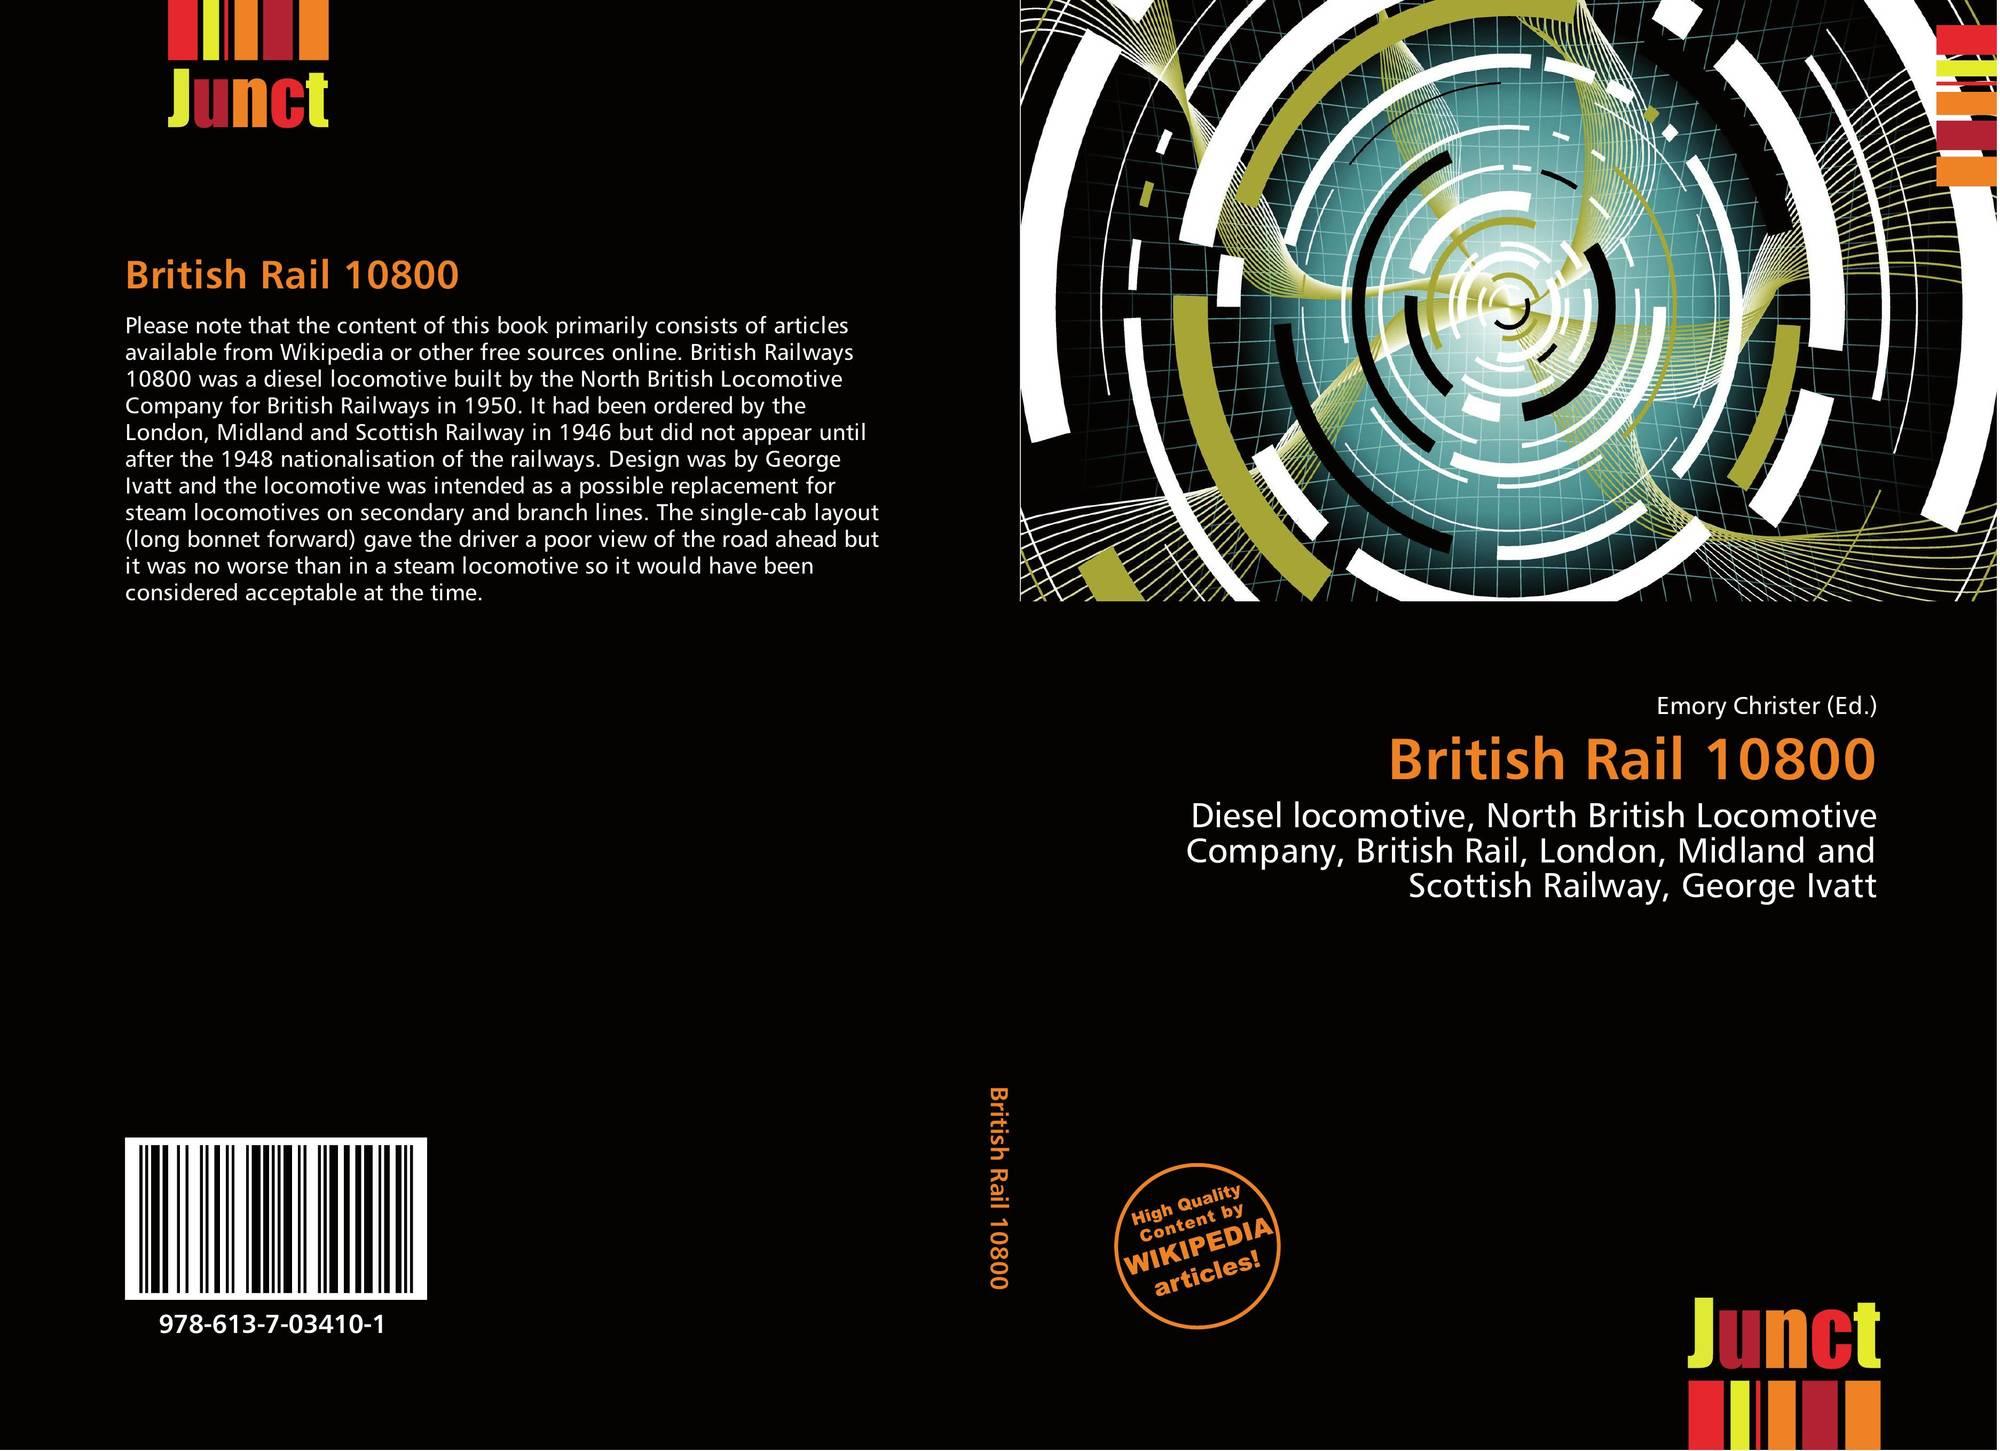 British Rail 10800, 978-613-7-03410-1, 6137034100 ,9786137034101